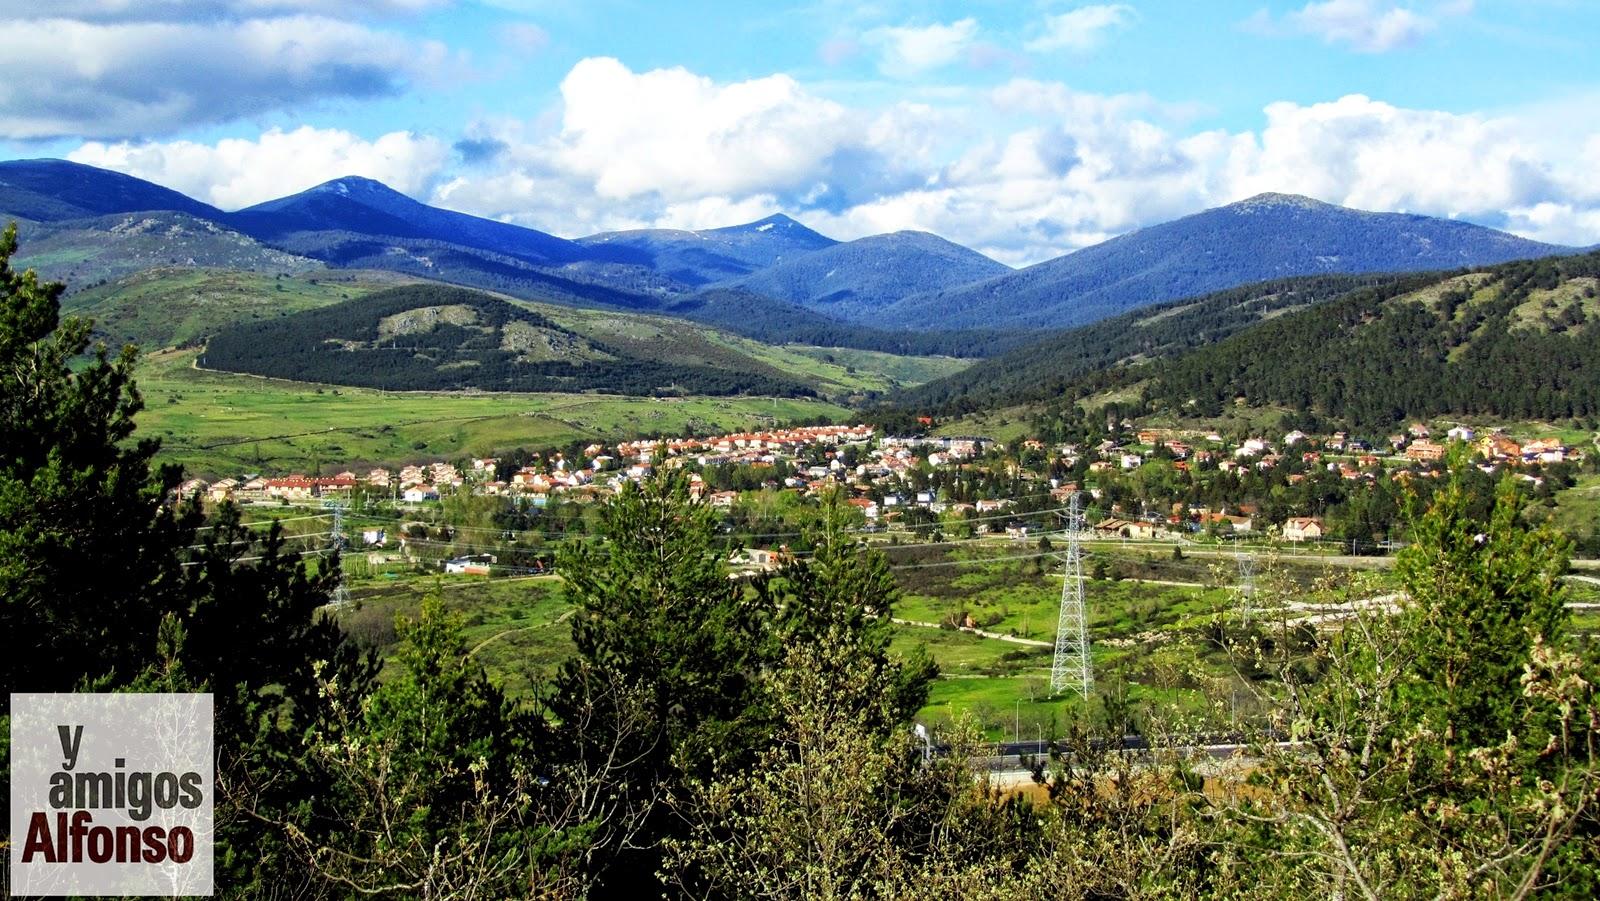 San Rafael - AlfonsoyAmigos